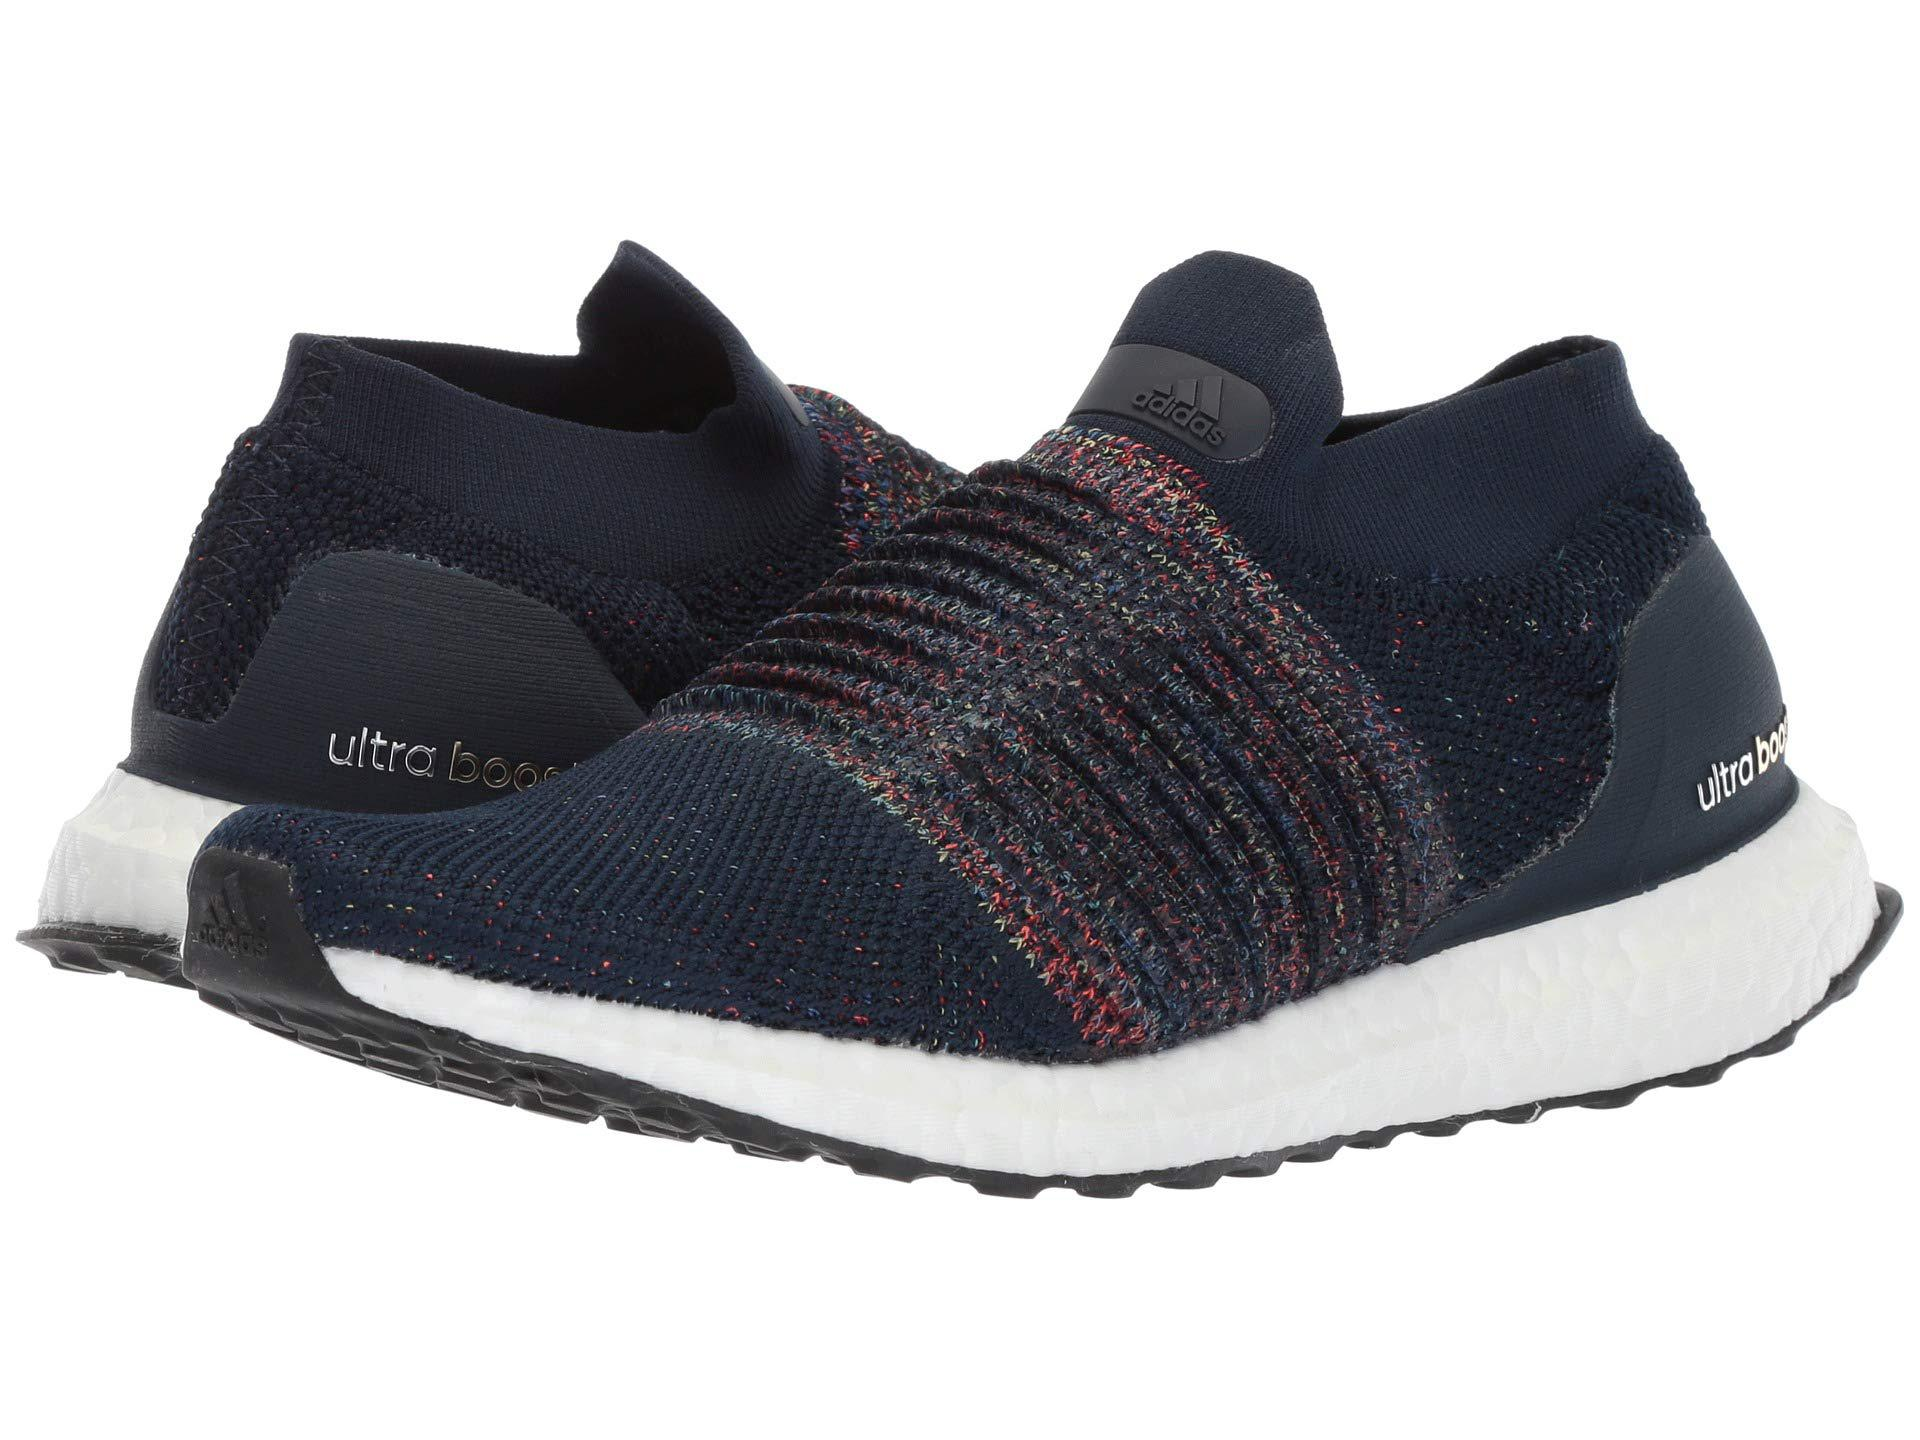 31860f9d2a0 Adidas Originals - Blue Ultraboost Laceless (collegiate Navy white black)  Men s Running. View fullscreen